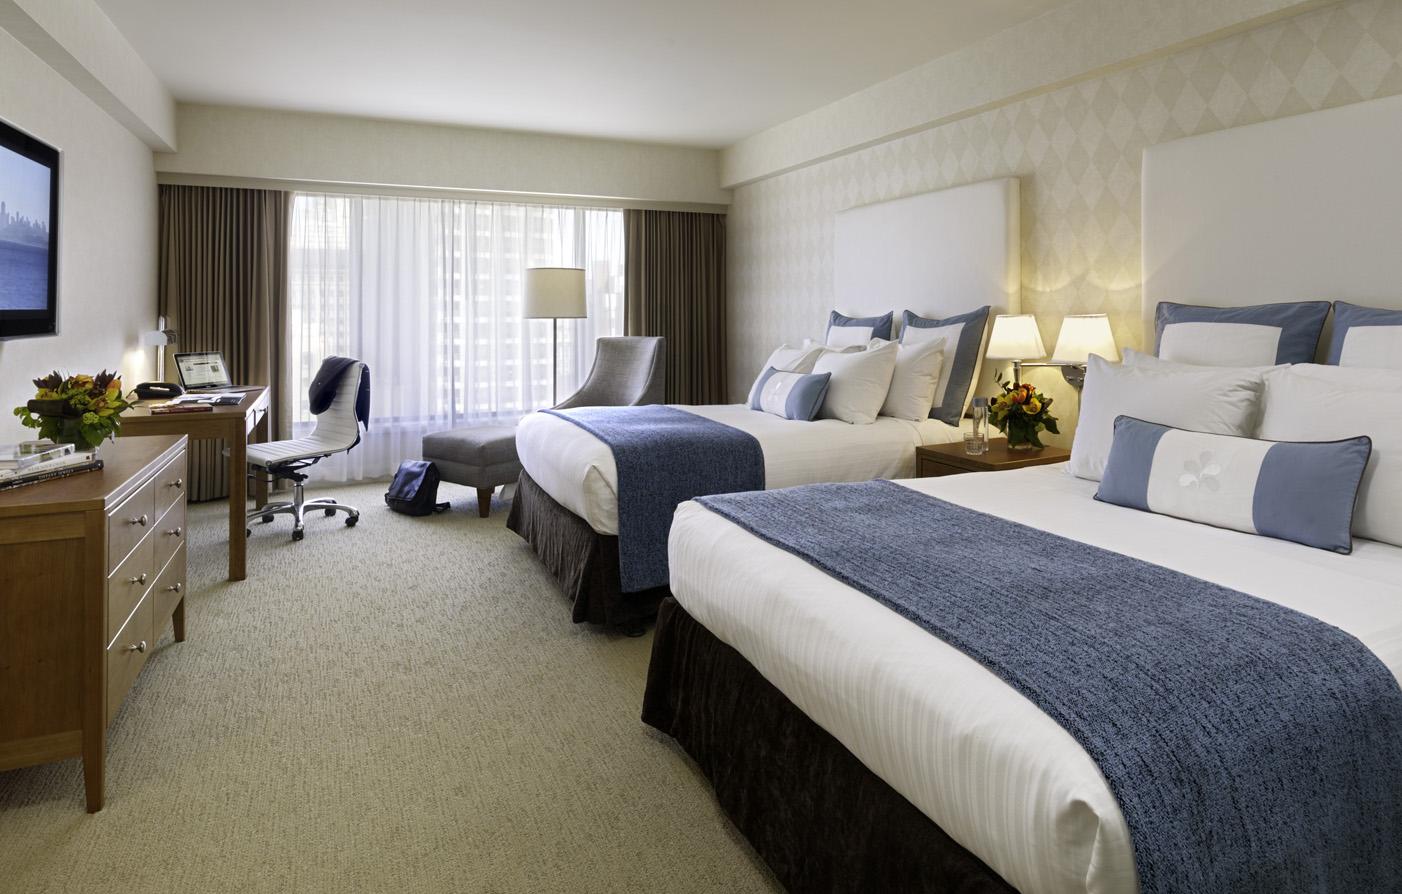 San francisco hotel accommodations hotel nikko san francisco for Bedroom furniture 94109